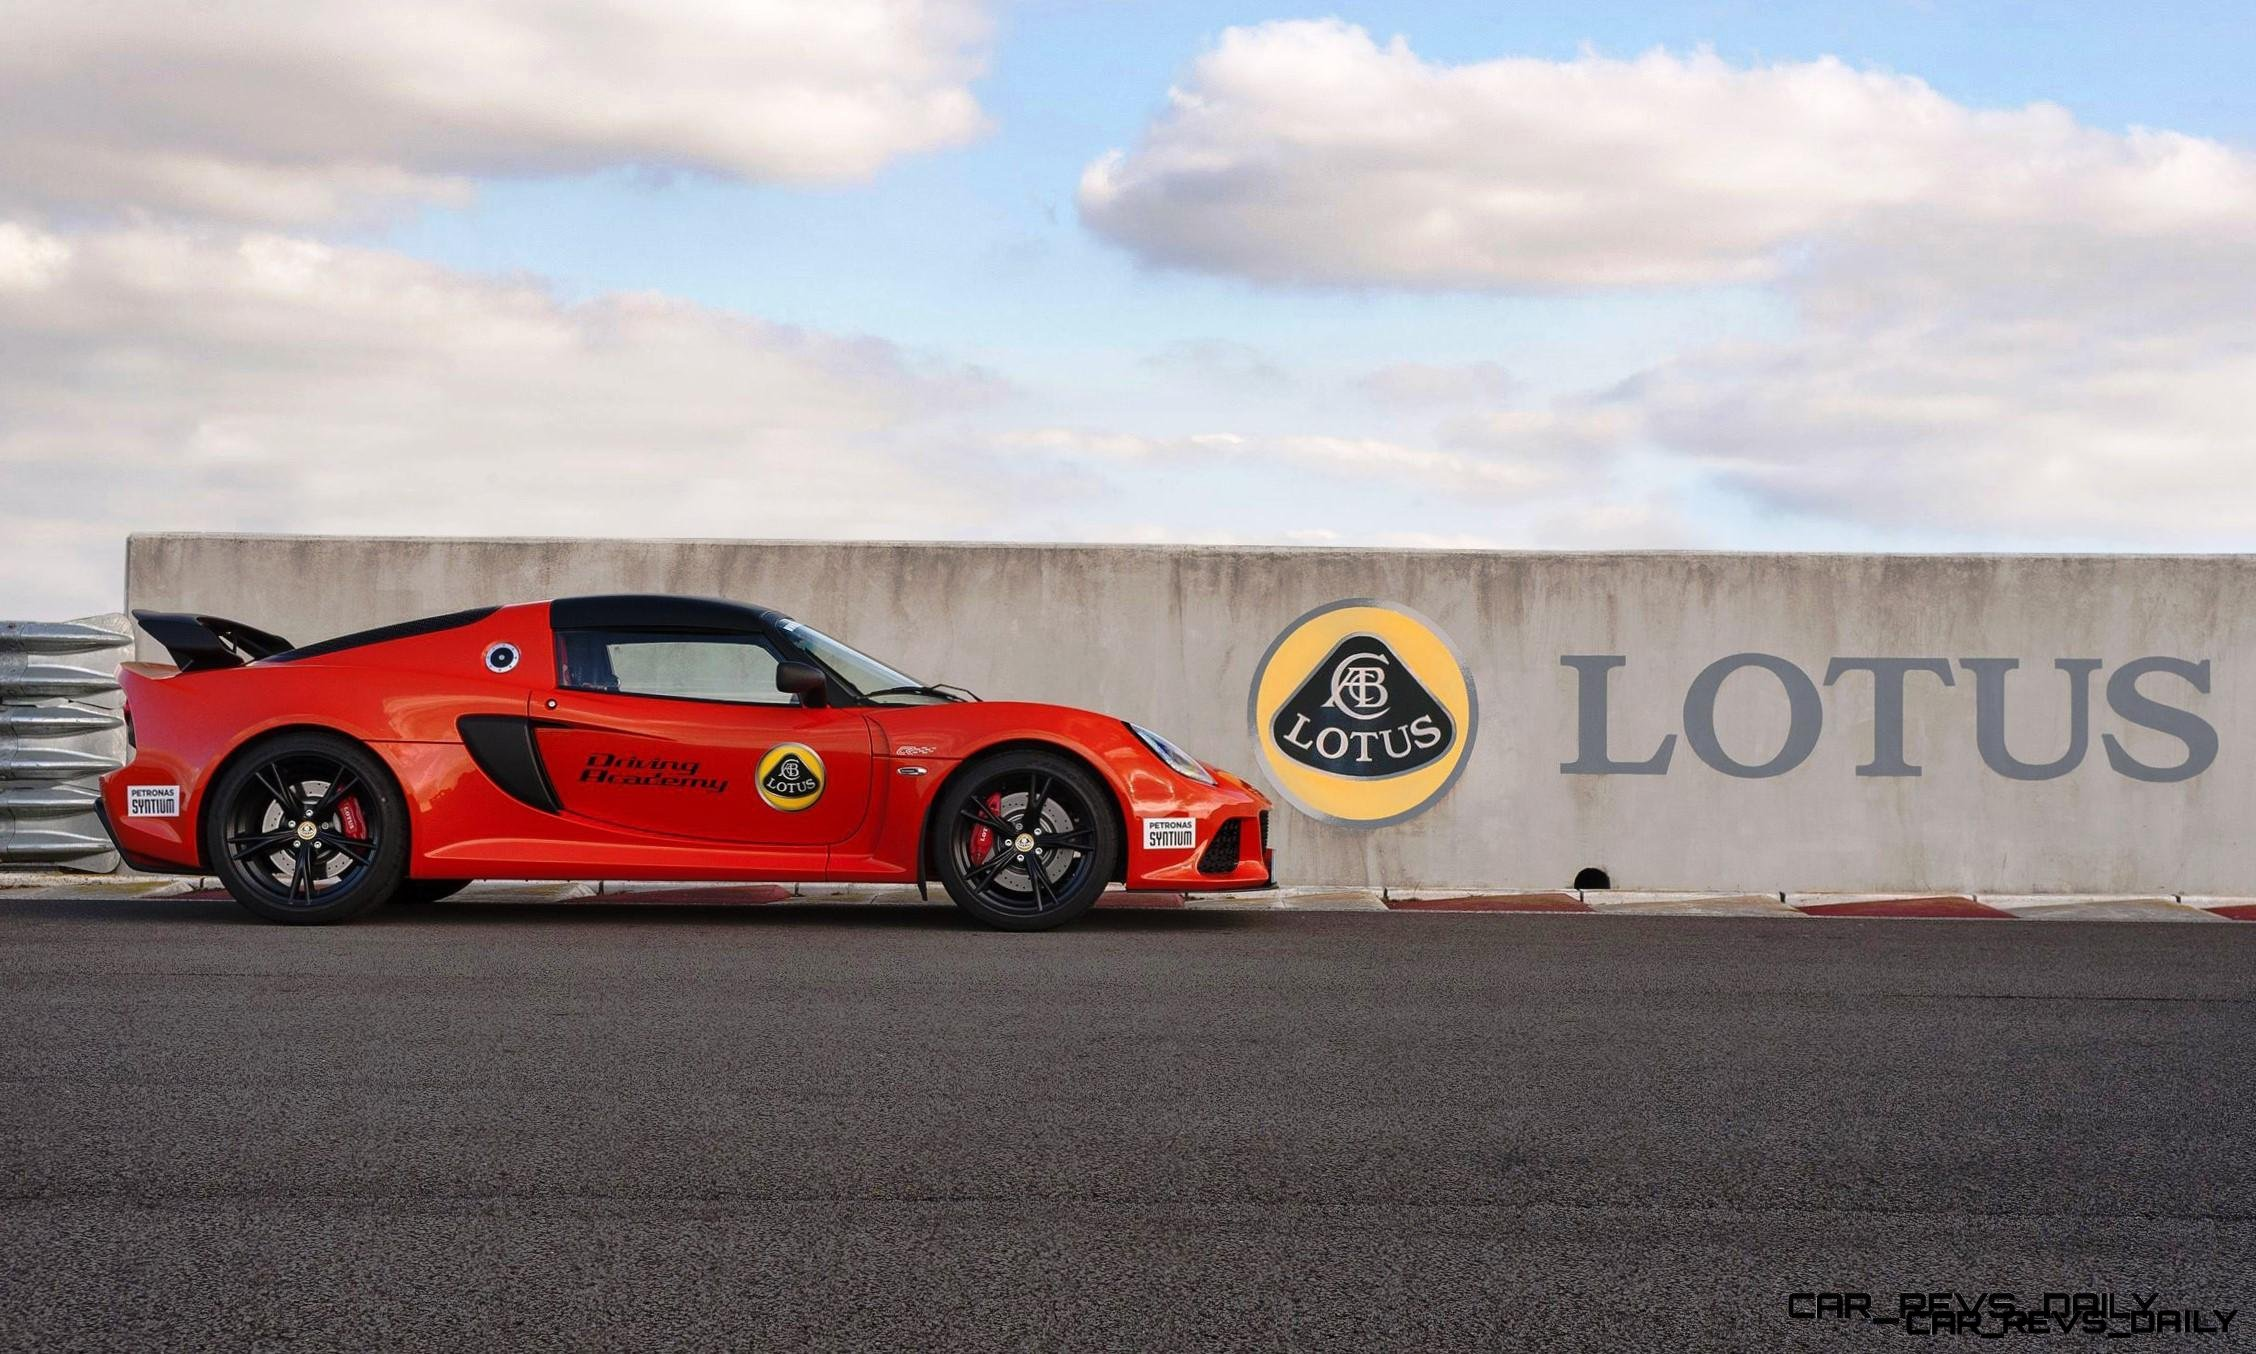 http://www.car-revs-daily.com/wp-content/uploads/2015/12/2016-Lotus-EXIGE-SPORT-350-1.jpg